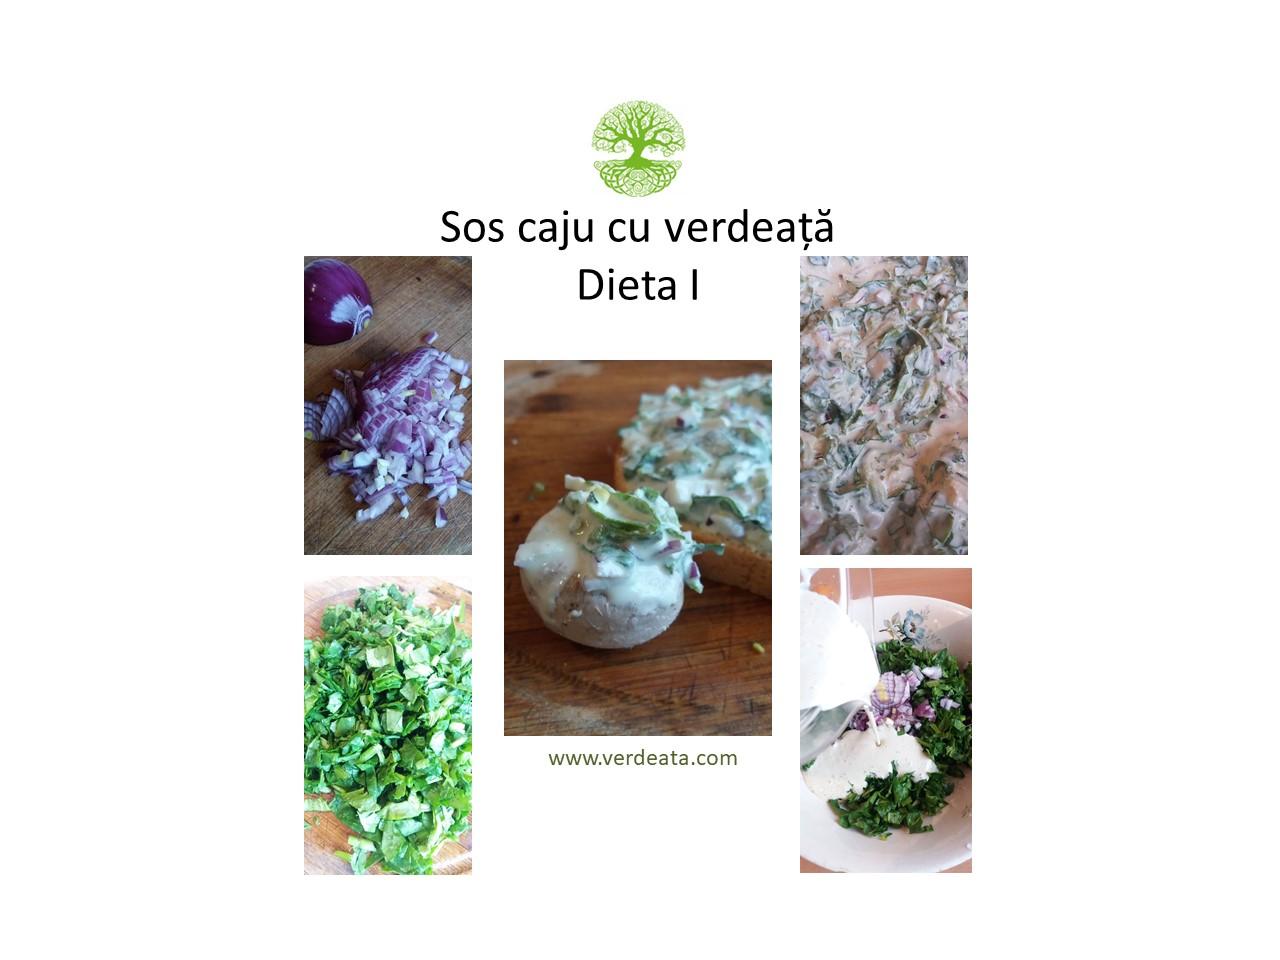 Sos caju cu verdeata - Dieta I